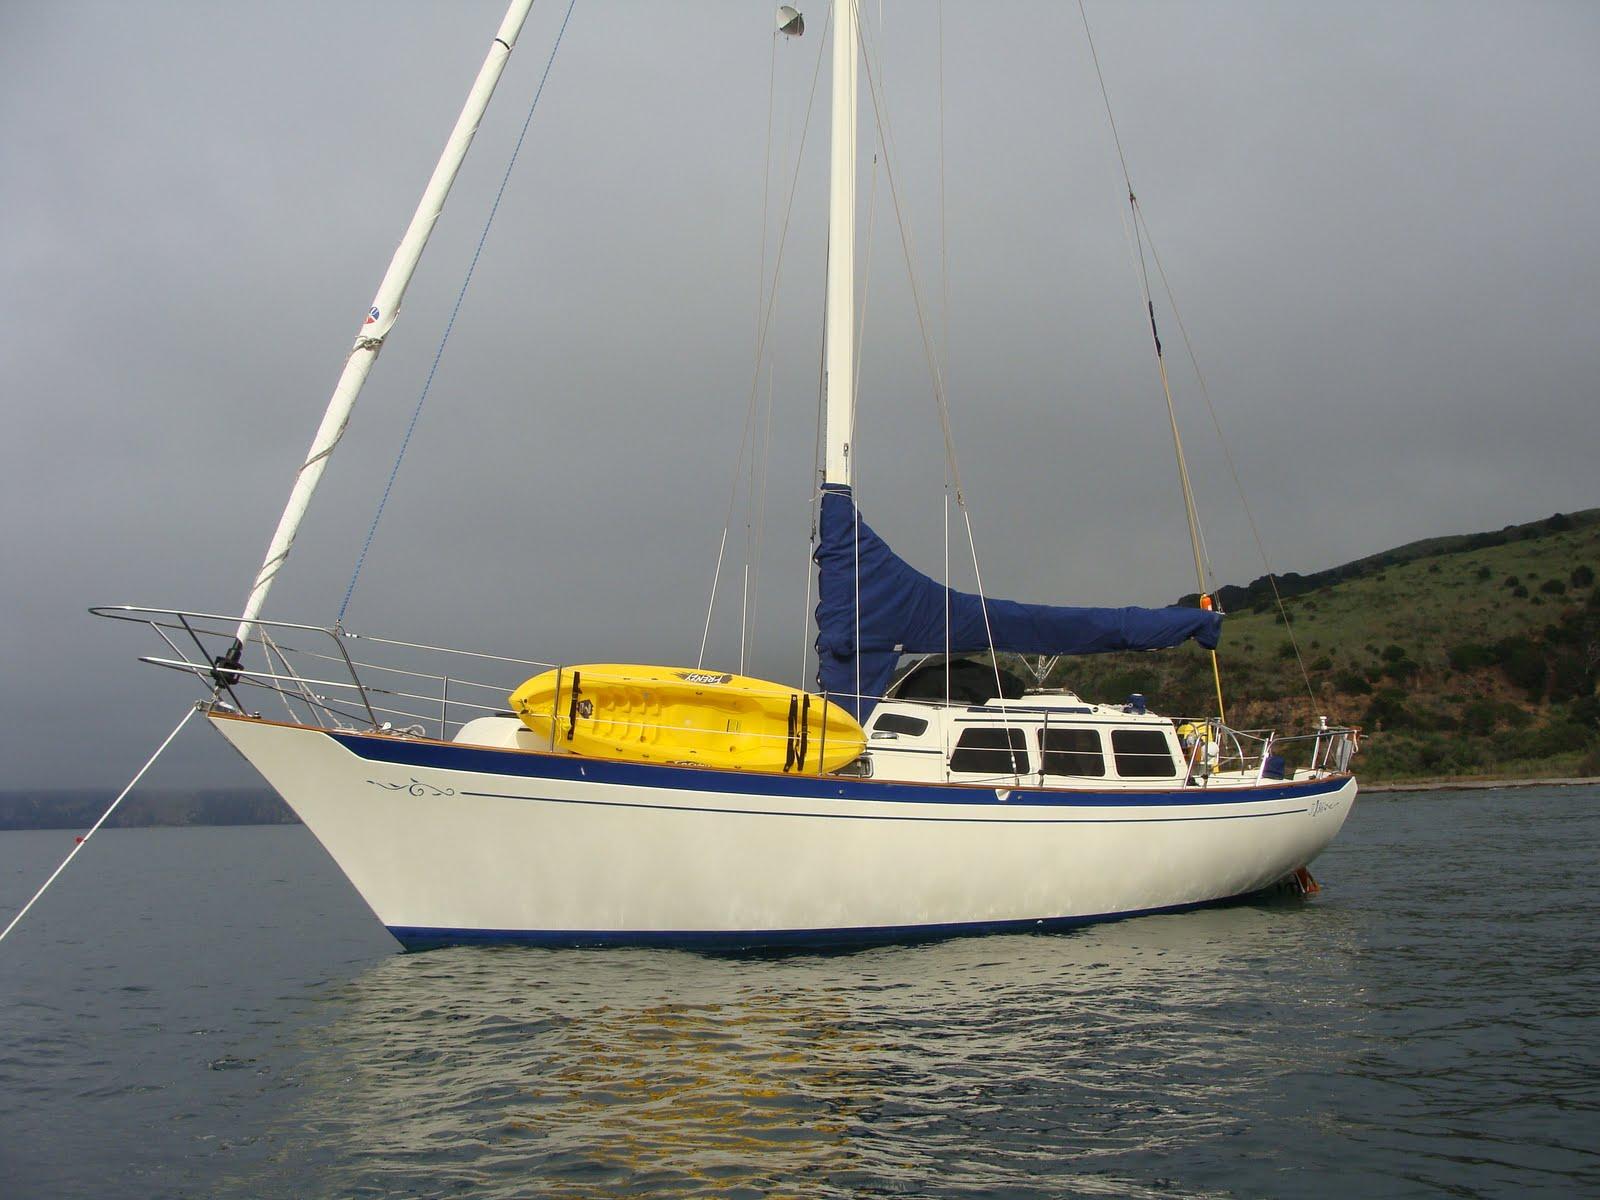 Spray - 1980 Islander Freeport 36: July 2010